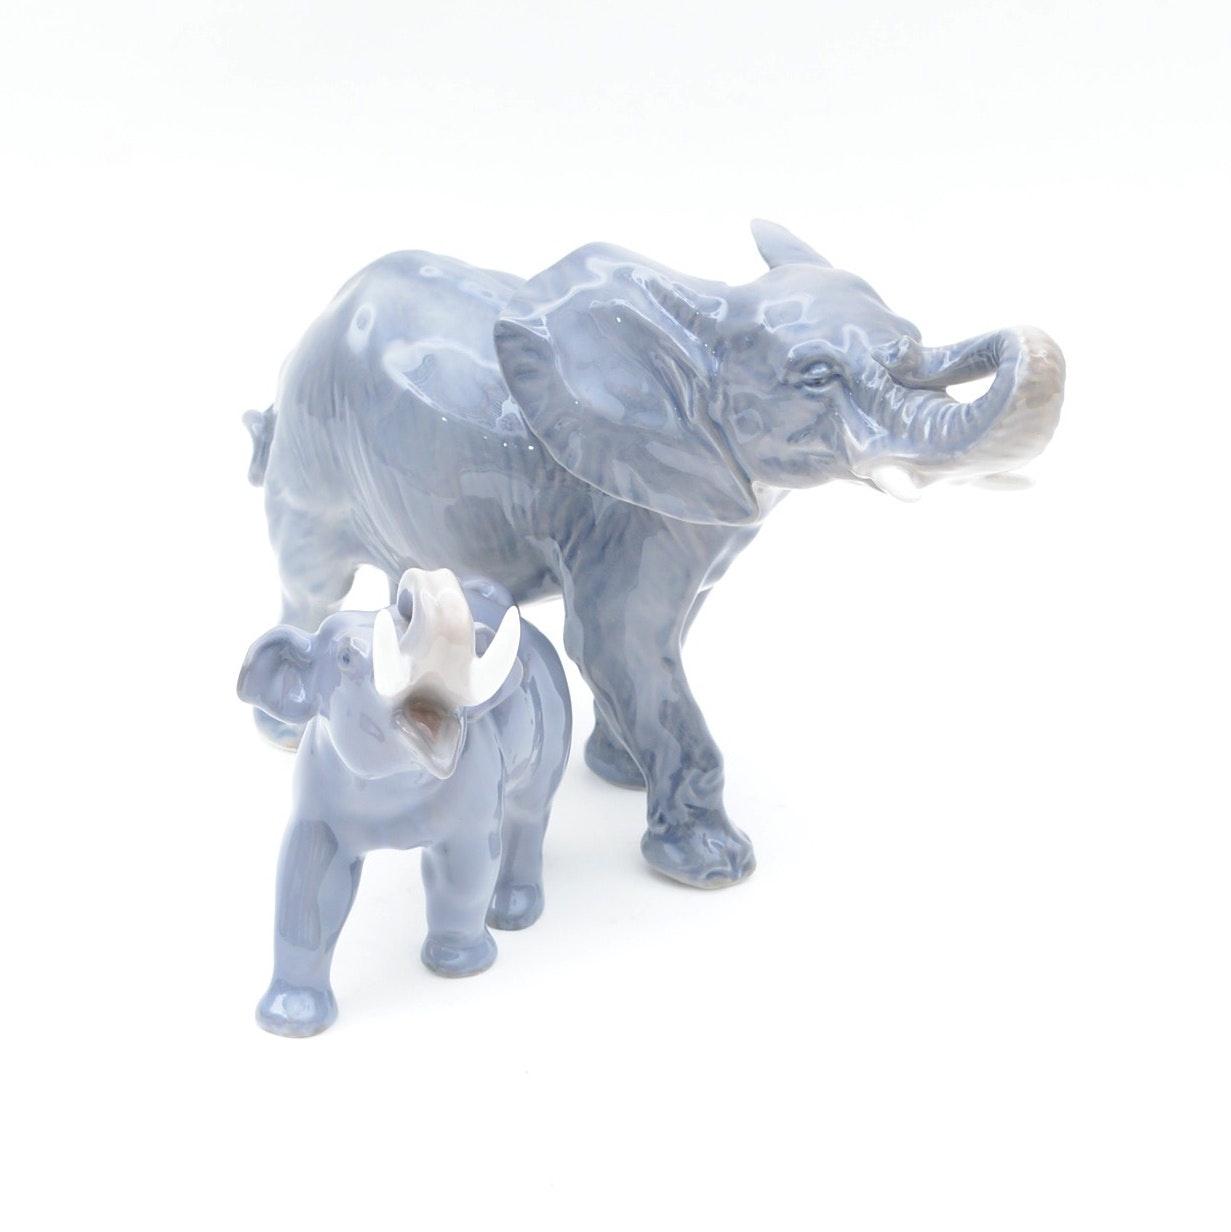 Royal Copenhagen Elephant Figurines